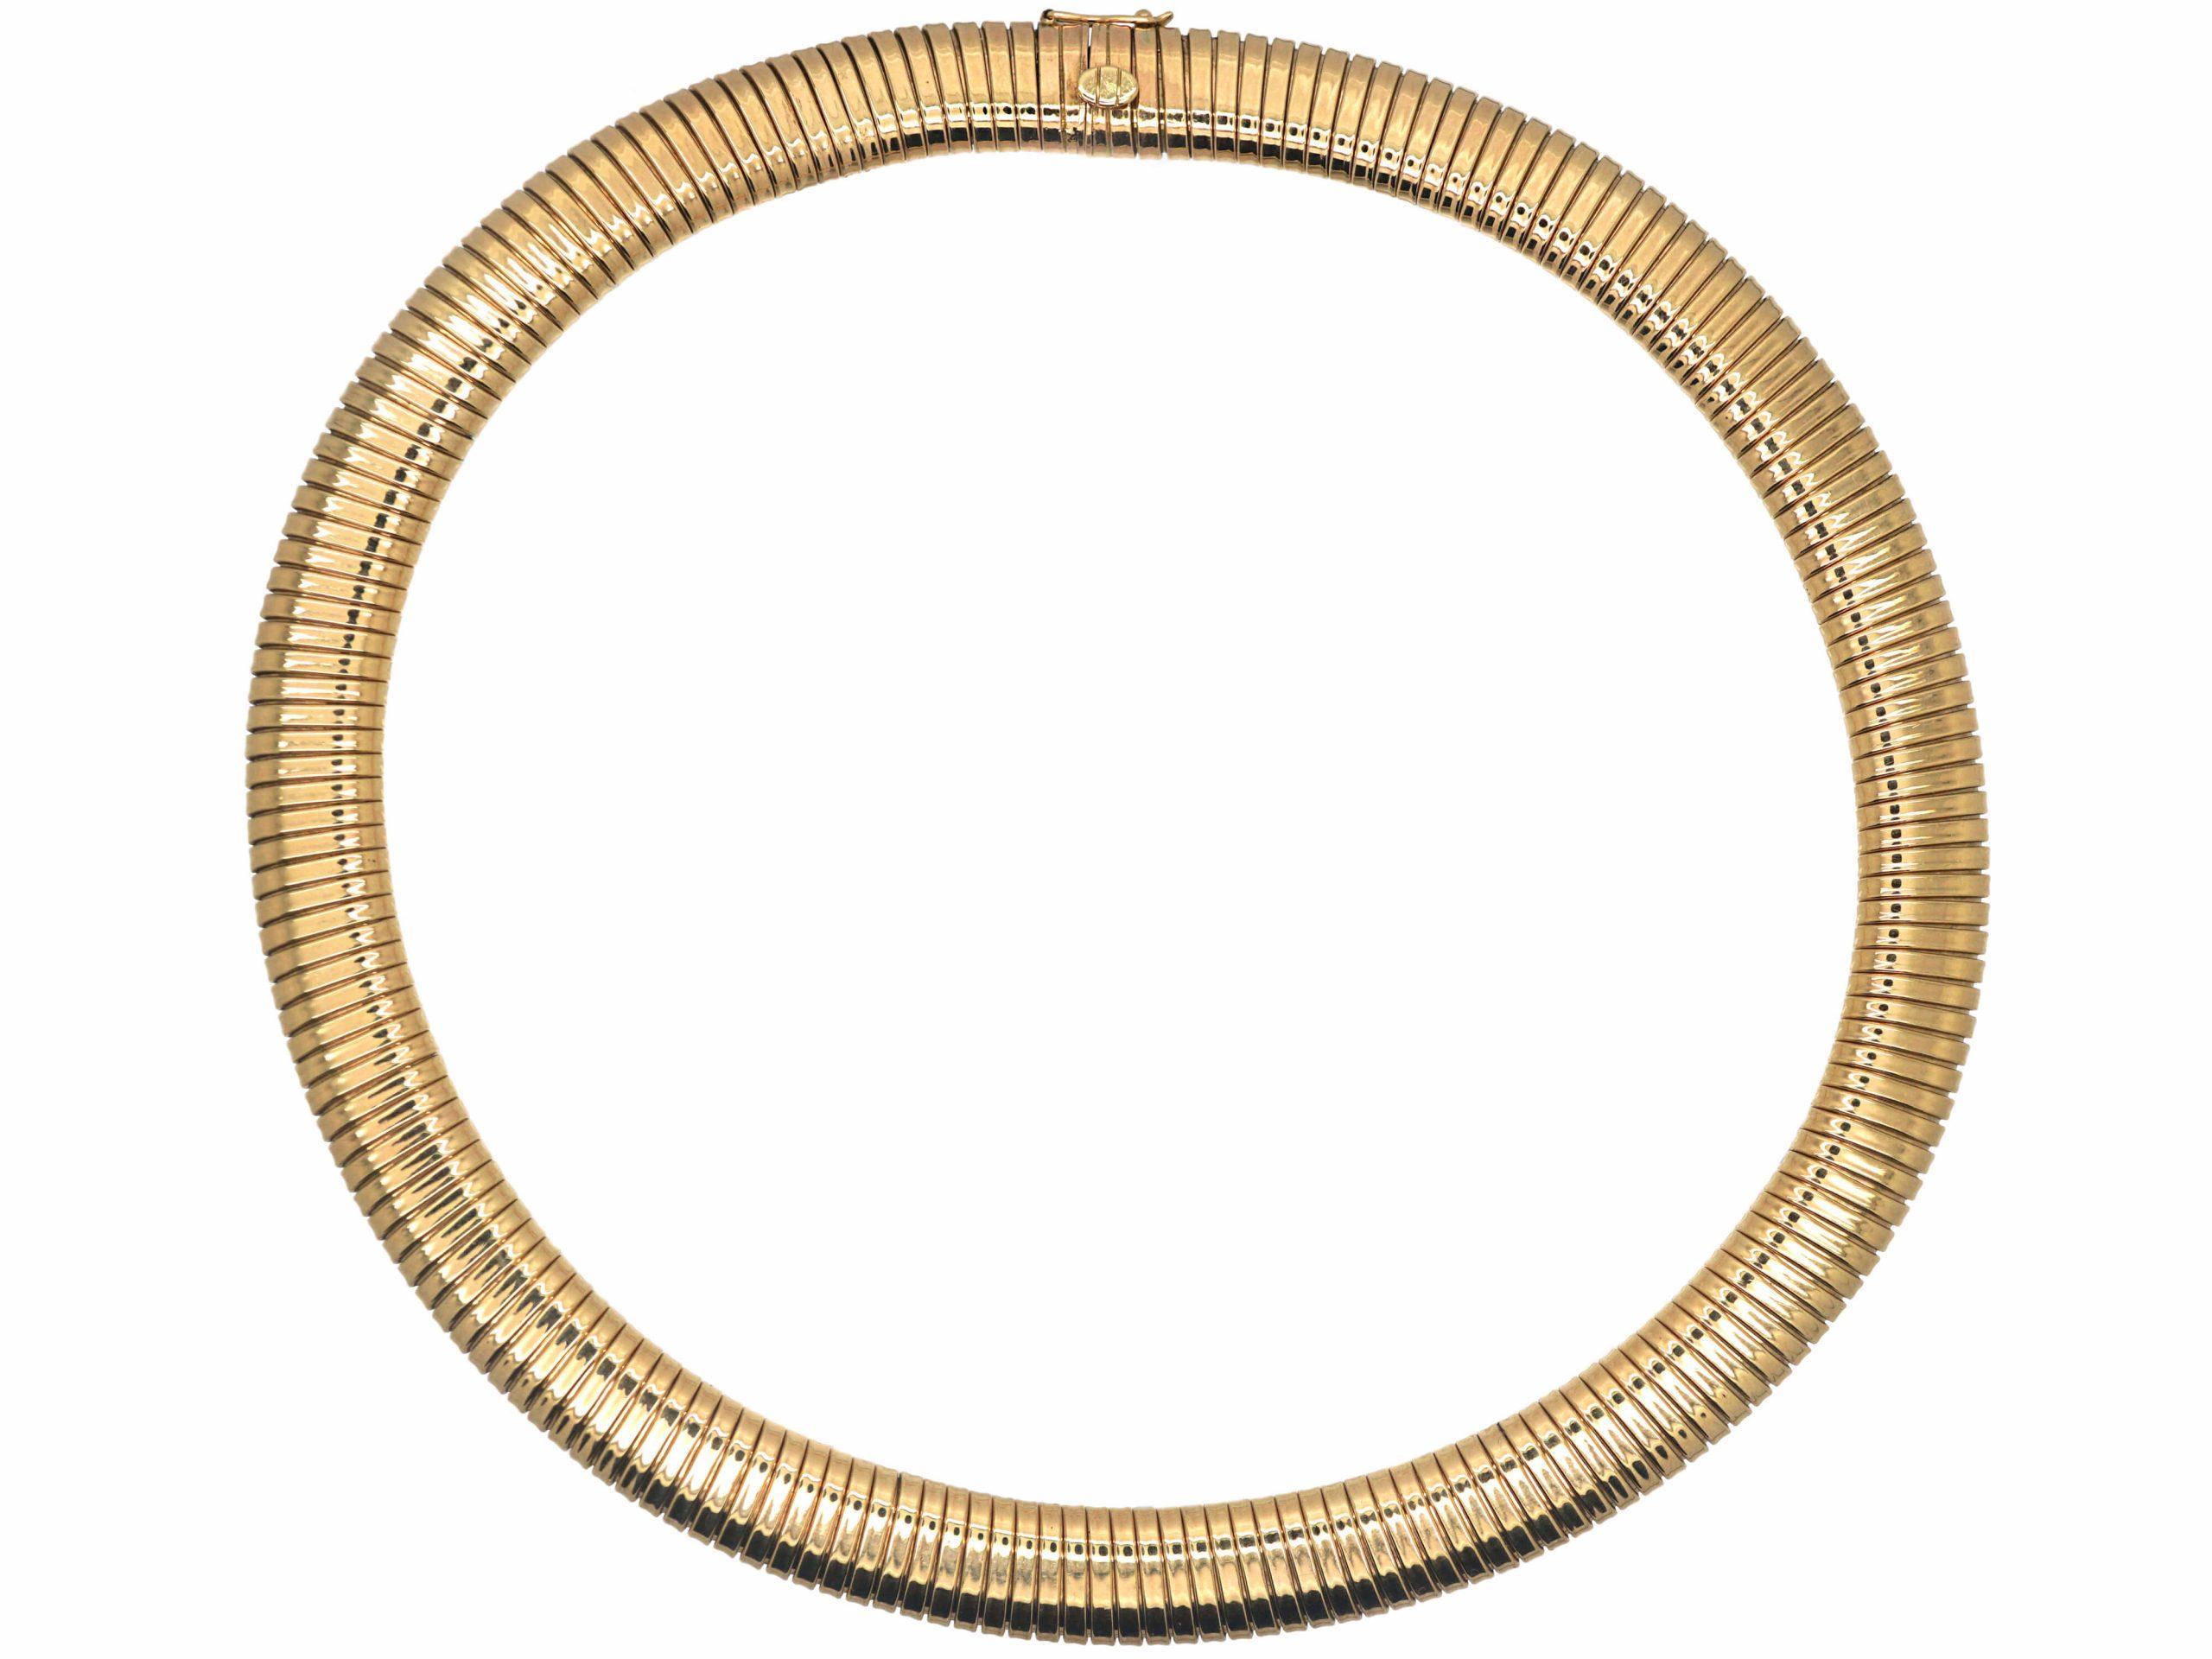 Retro Gas Pipe Flexible Tubogas 9ct Gold Collar Necklace